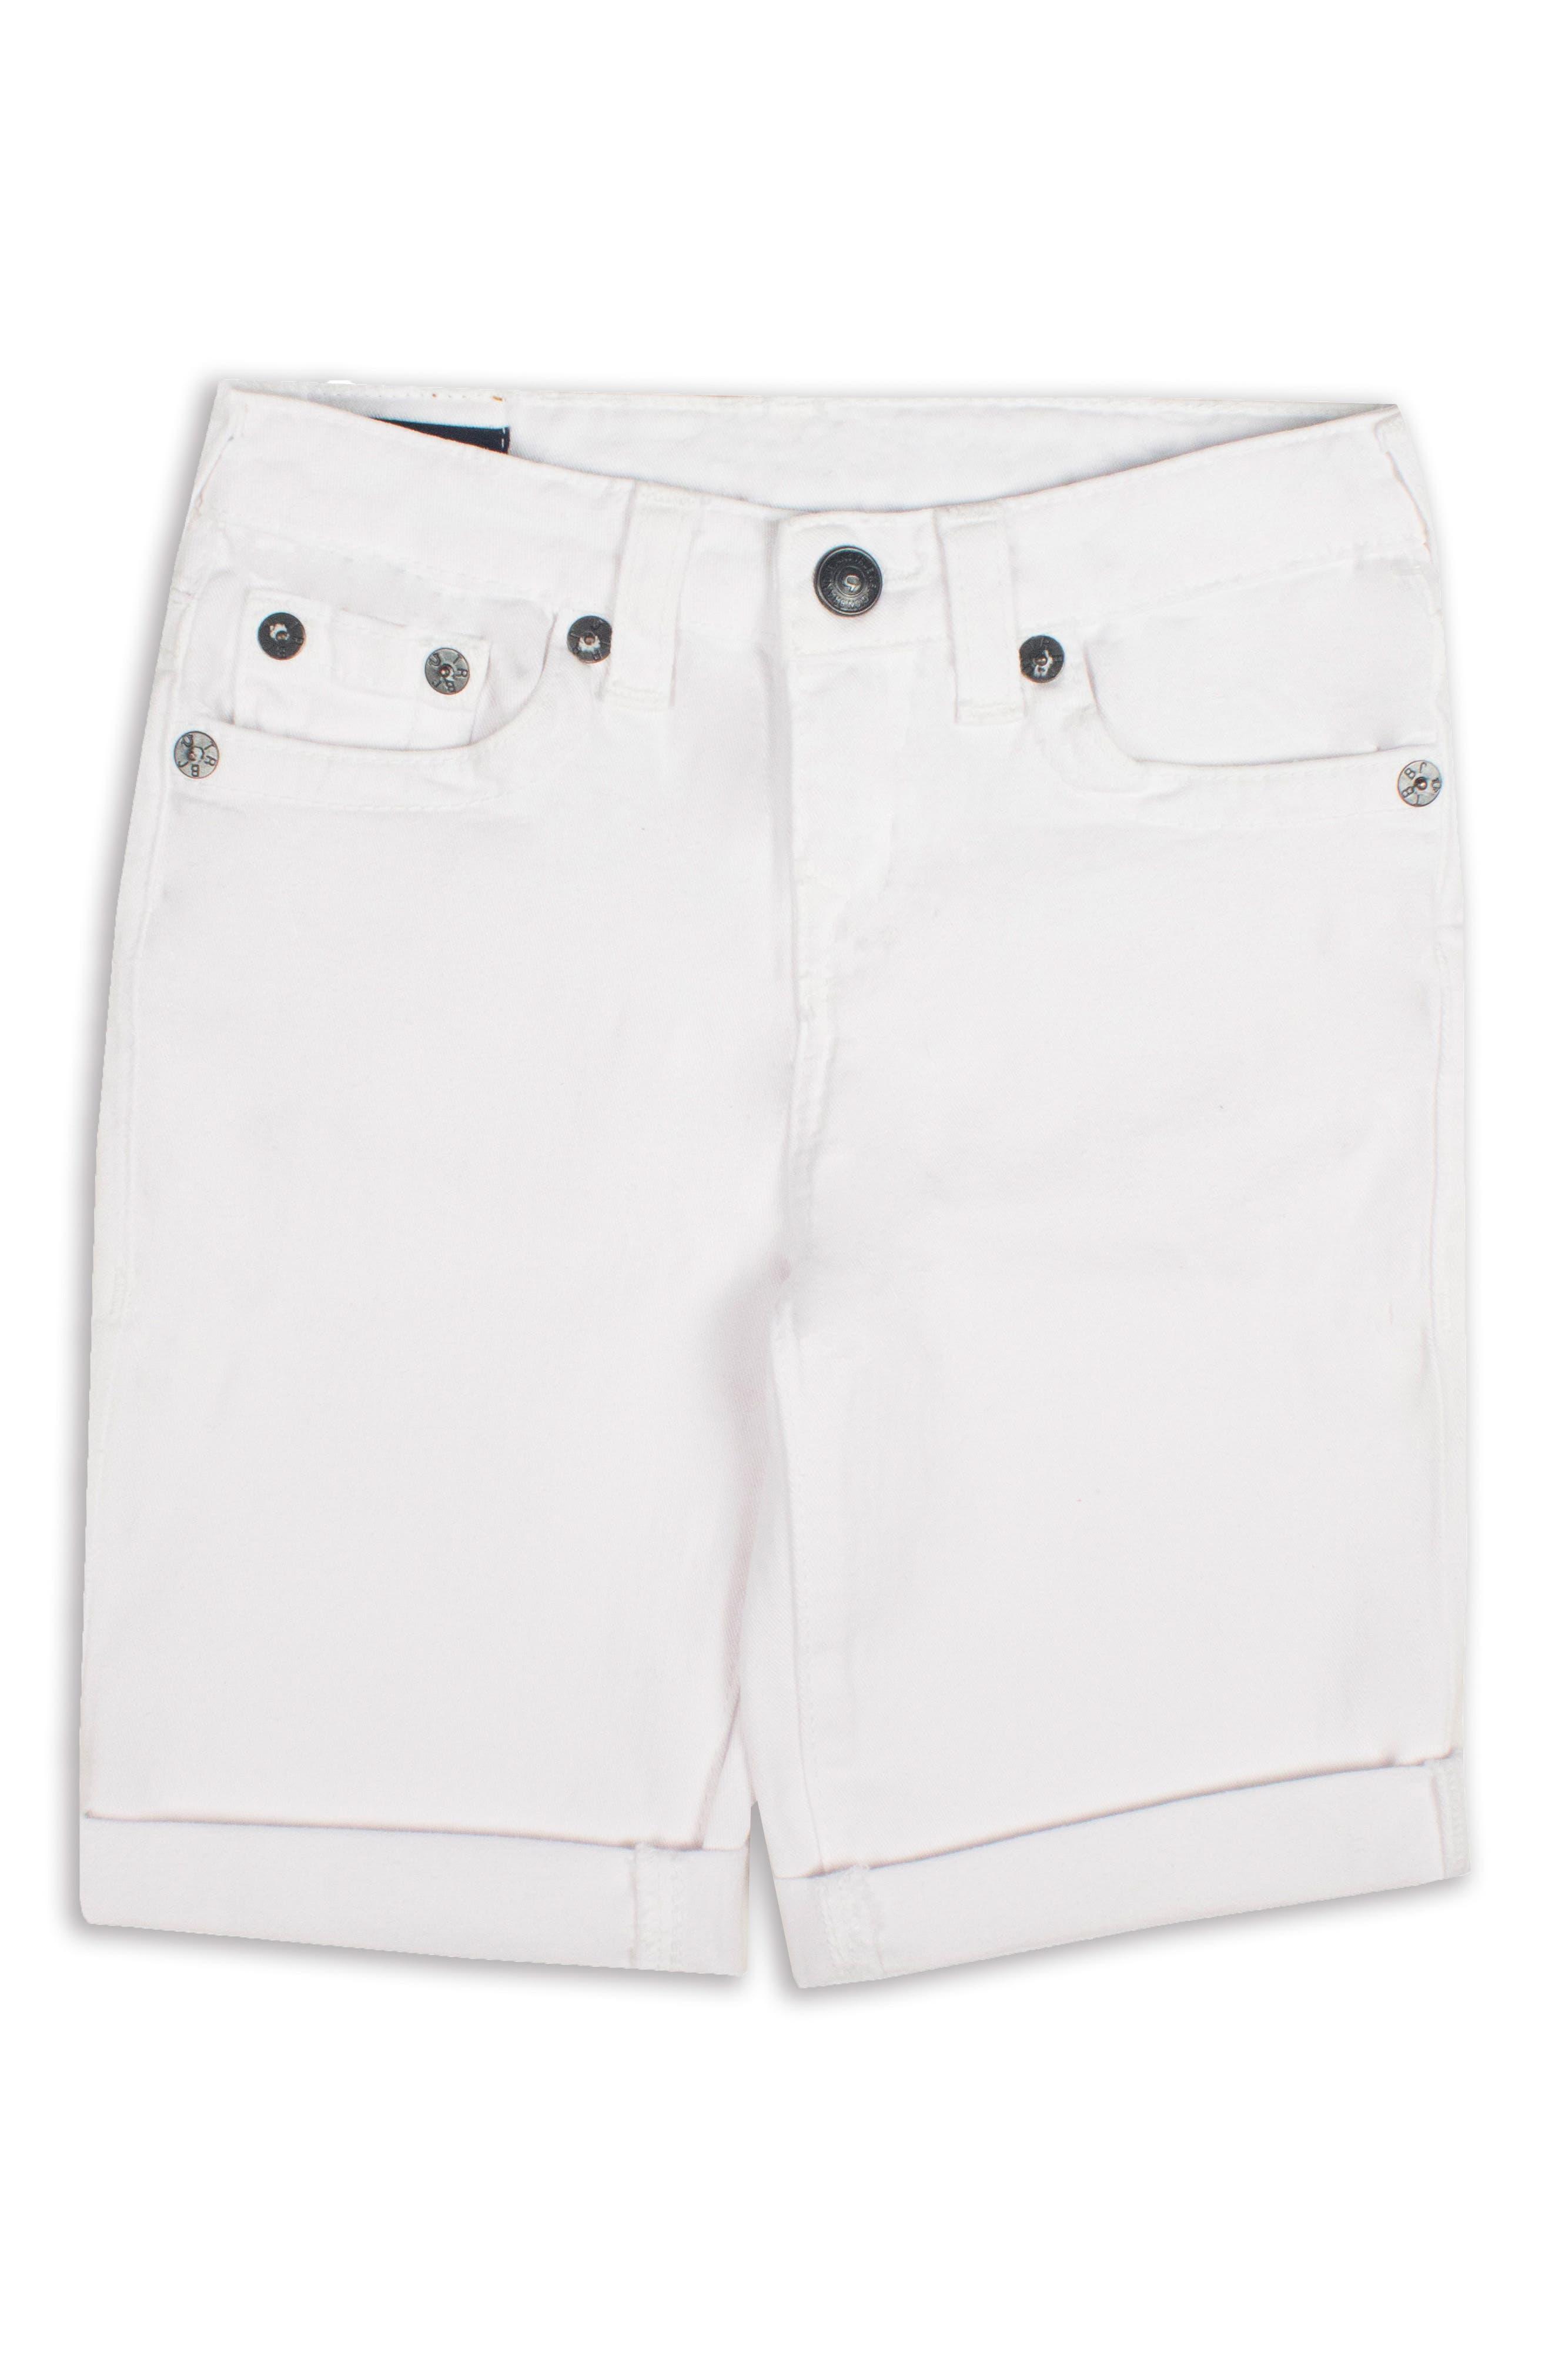 Main Image - True Religion Brand Jeans Geno Denim Shorts (Big Boys)